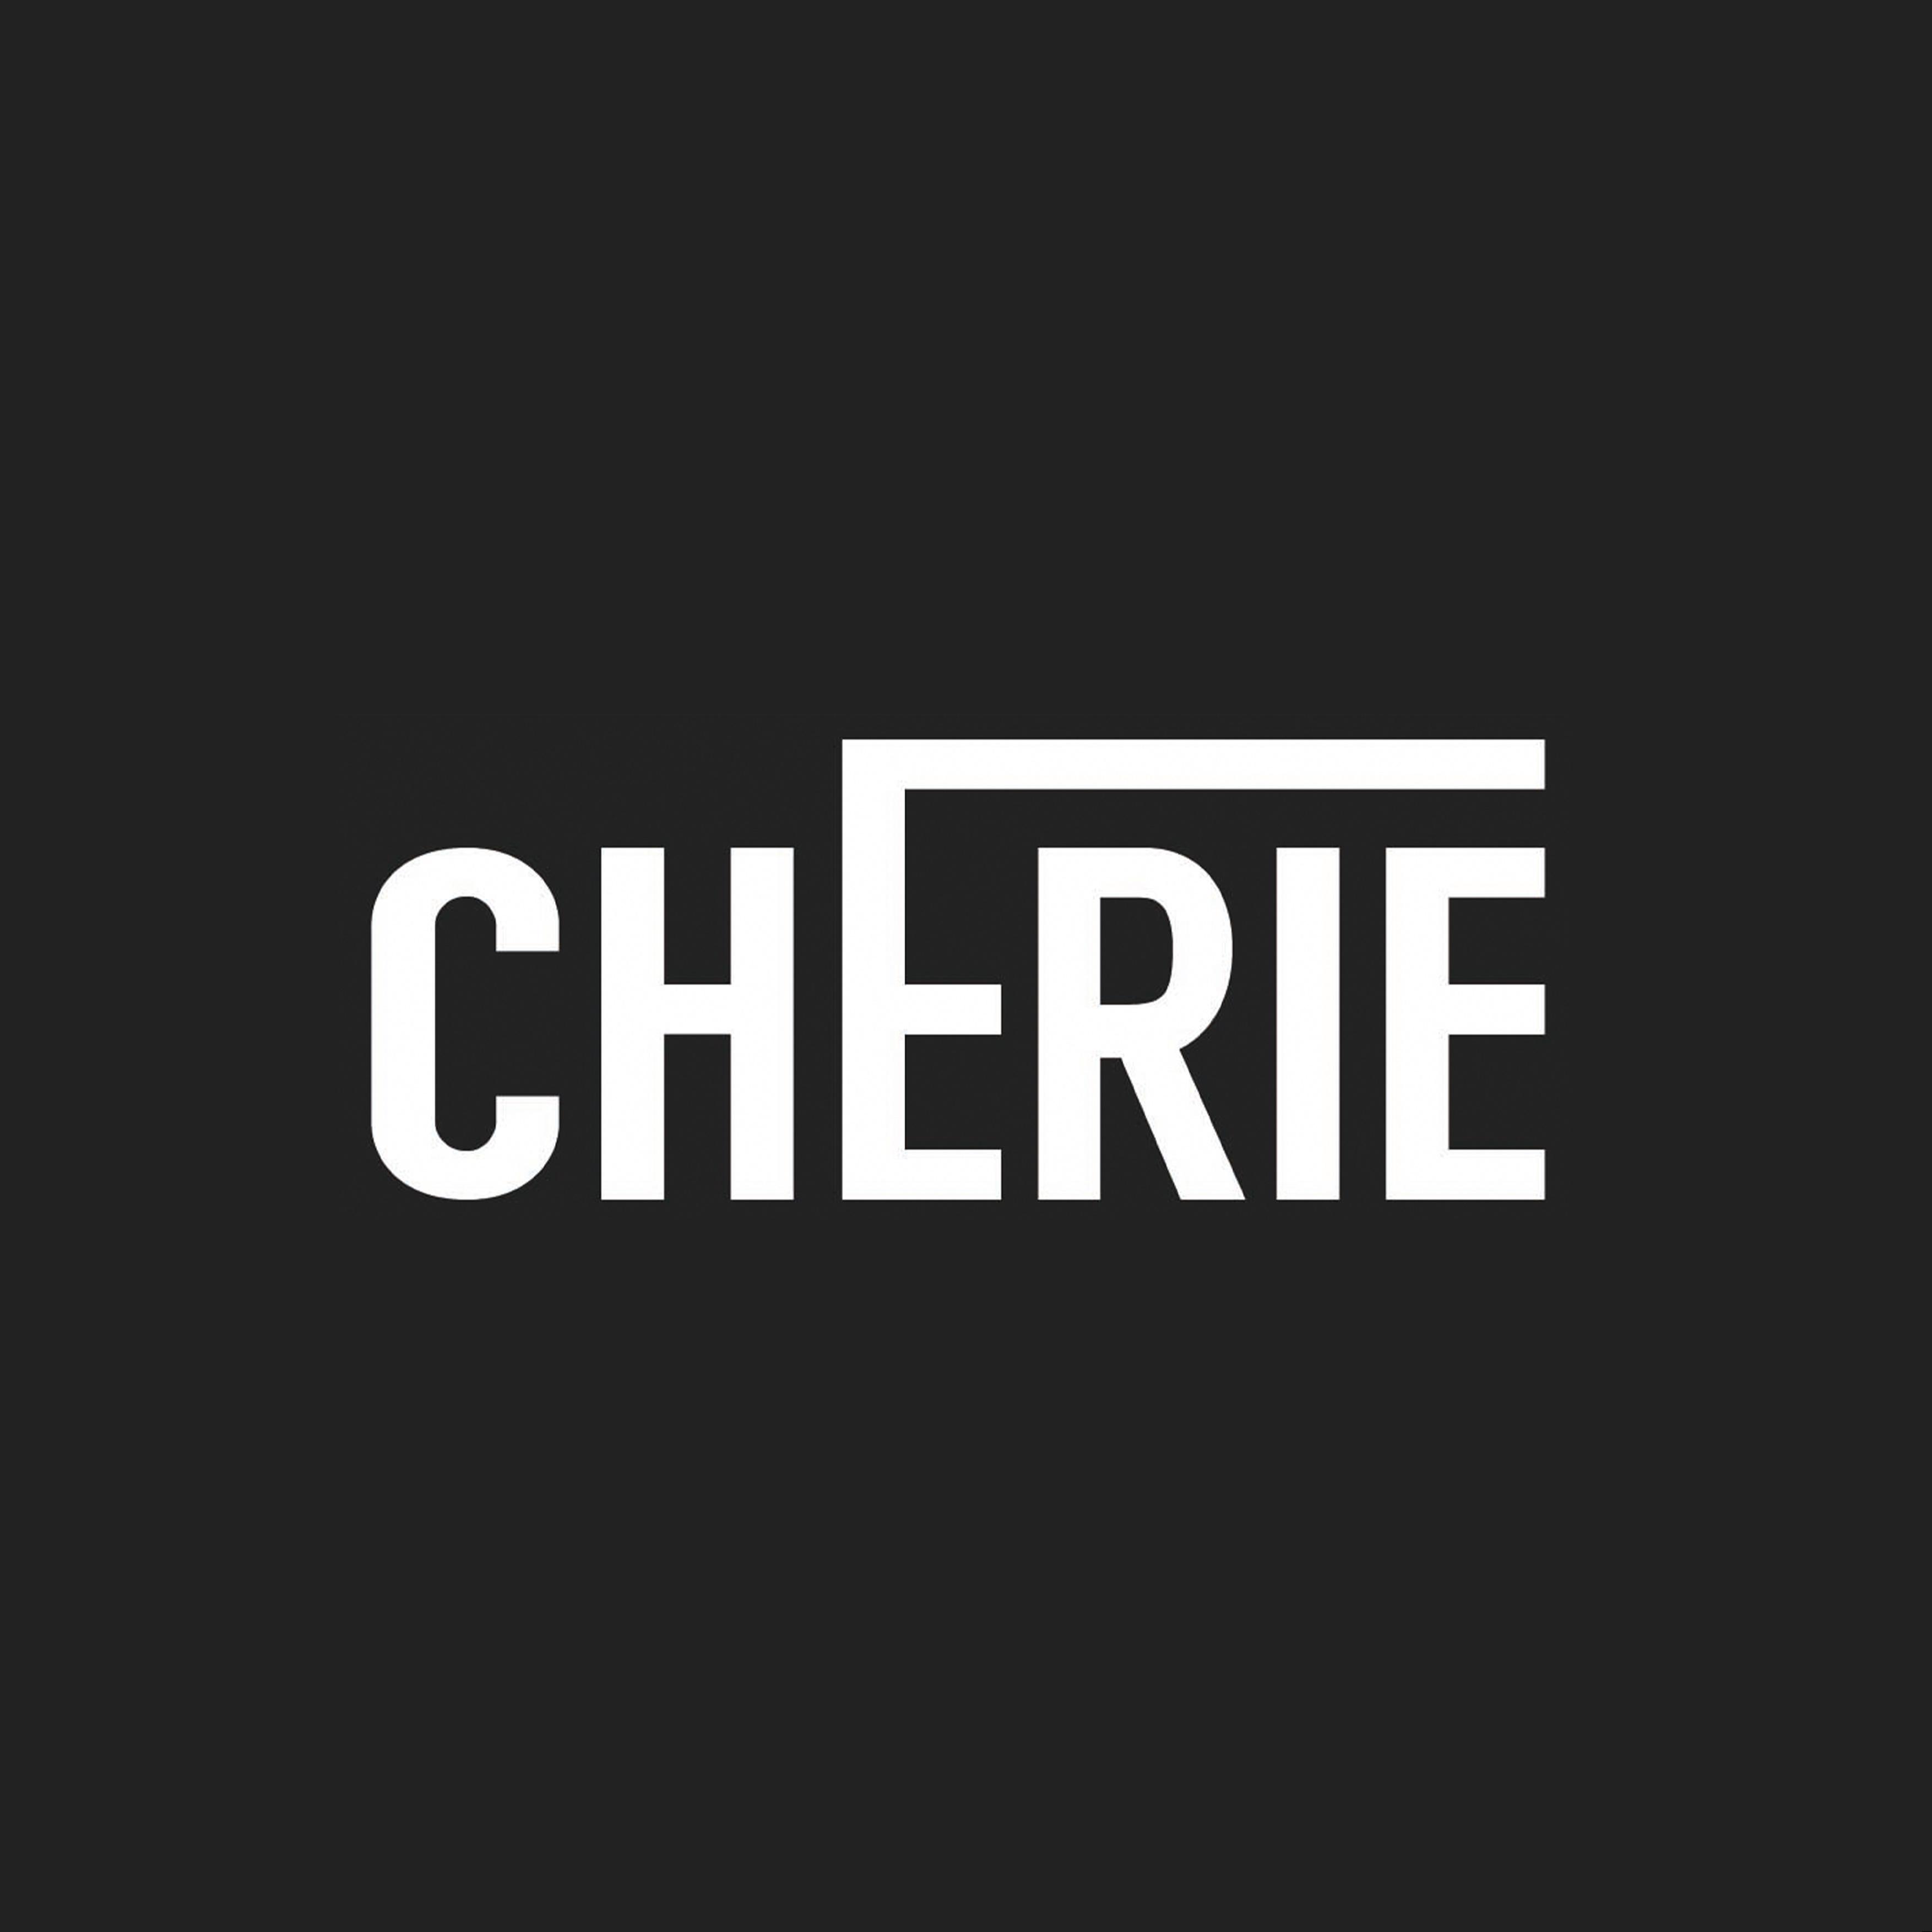 Cherie Asia